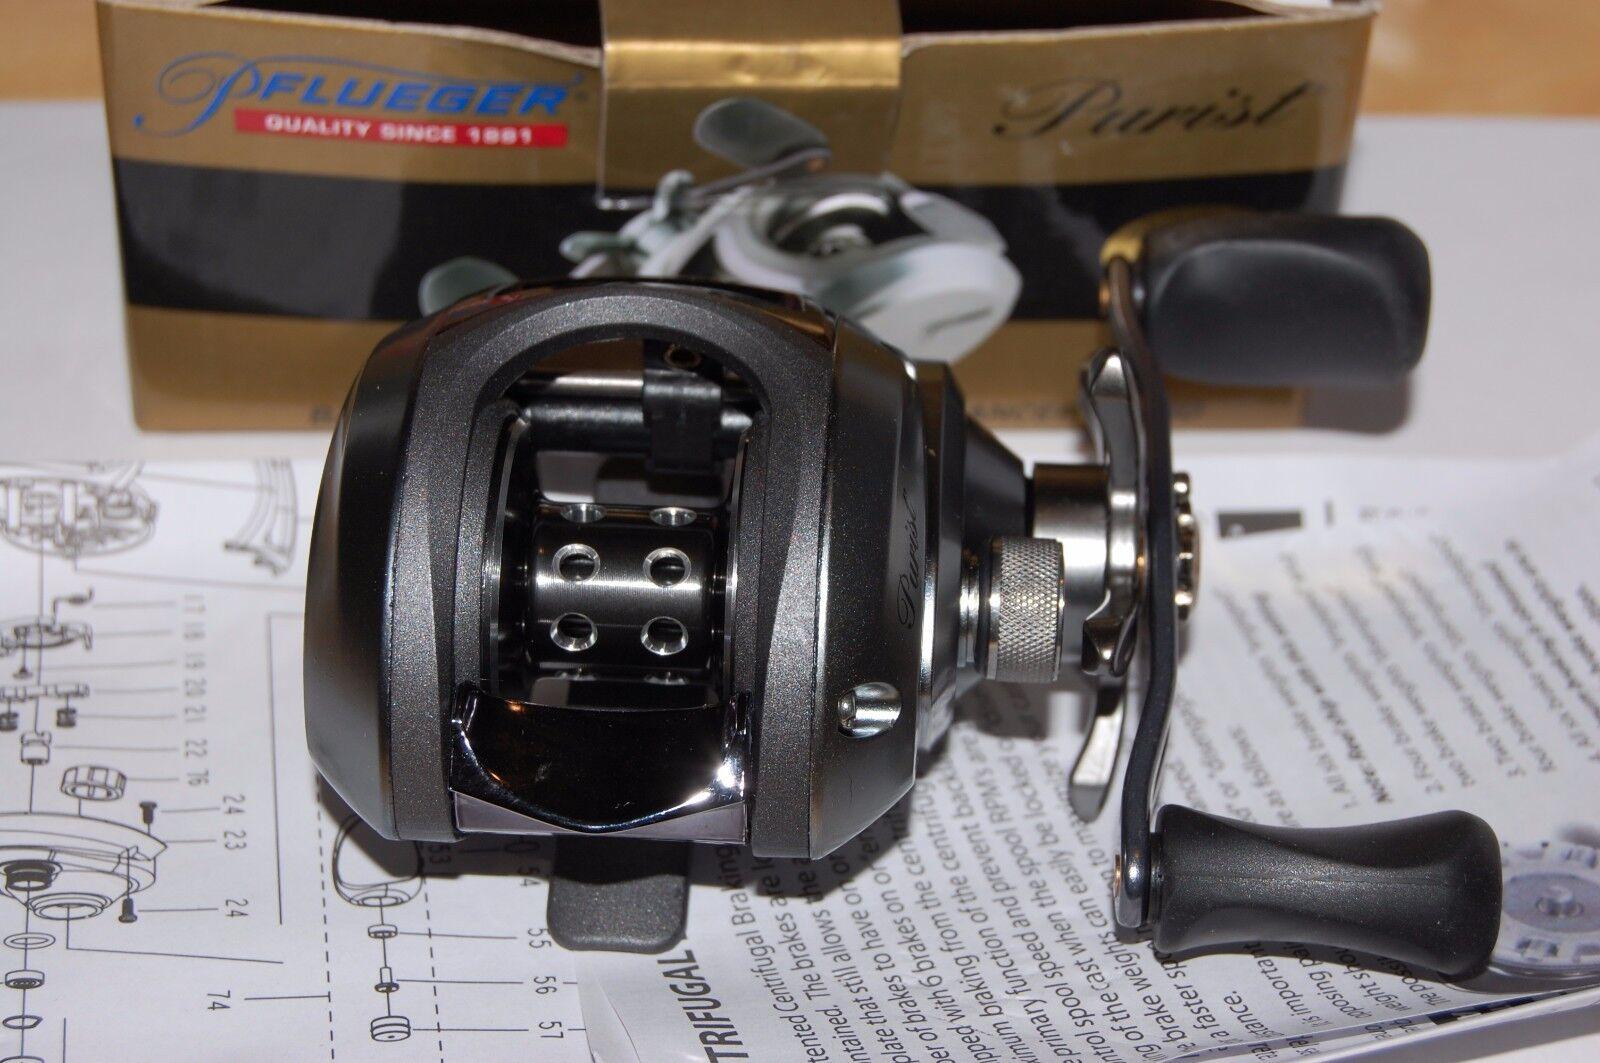 Pflueger Purist Fischen Spule Baitcast Rolle Bait Caster 8 Lager 7.1:1 Waffel Spule Fischen 8336d6